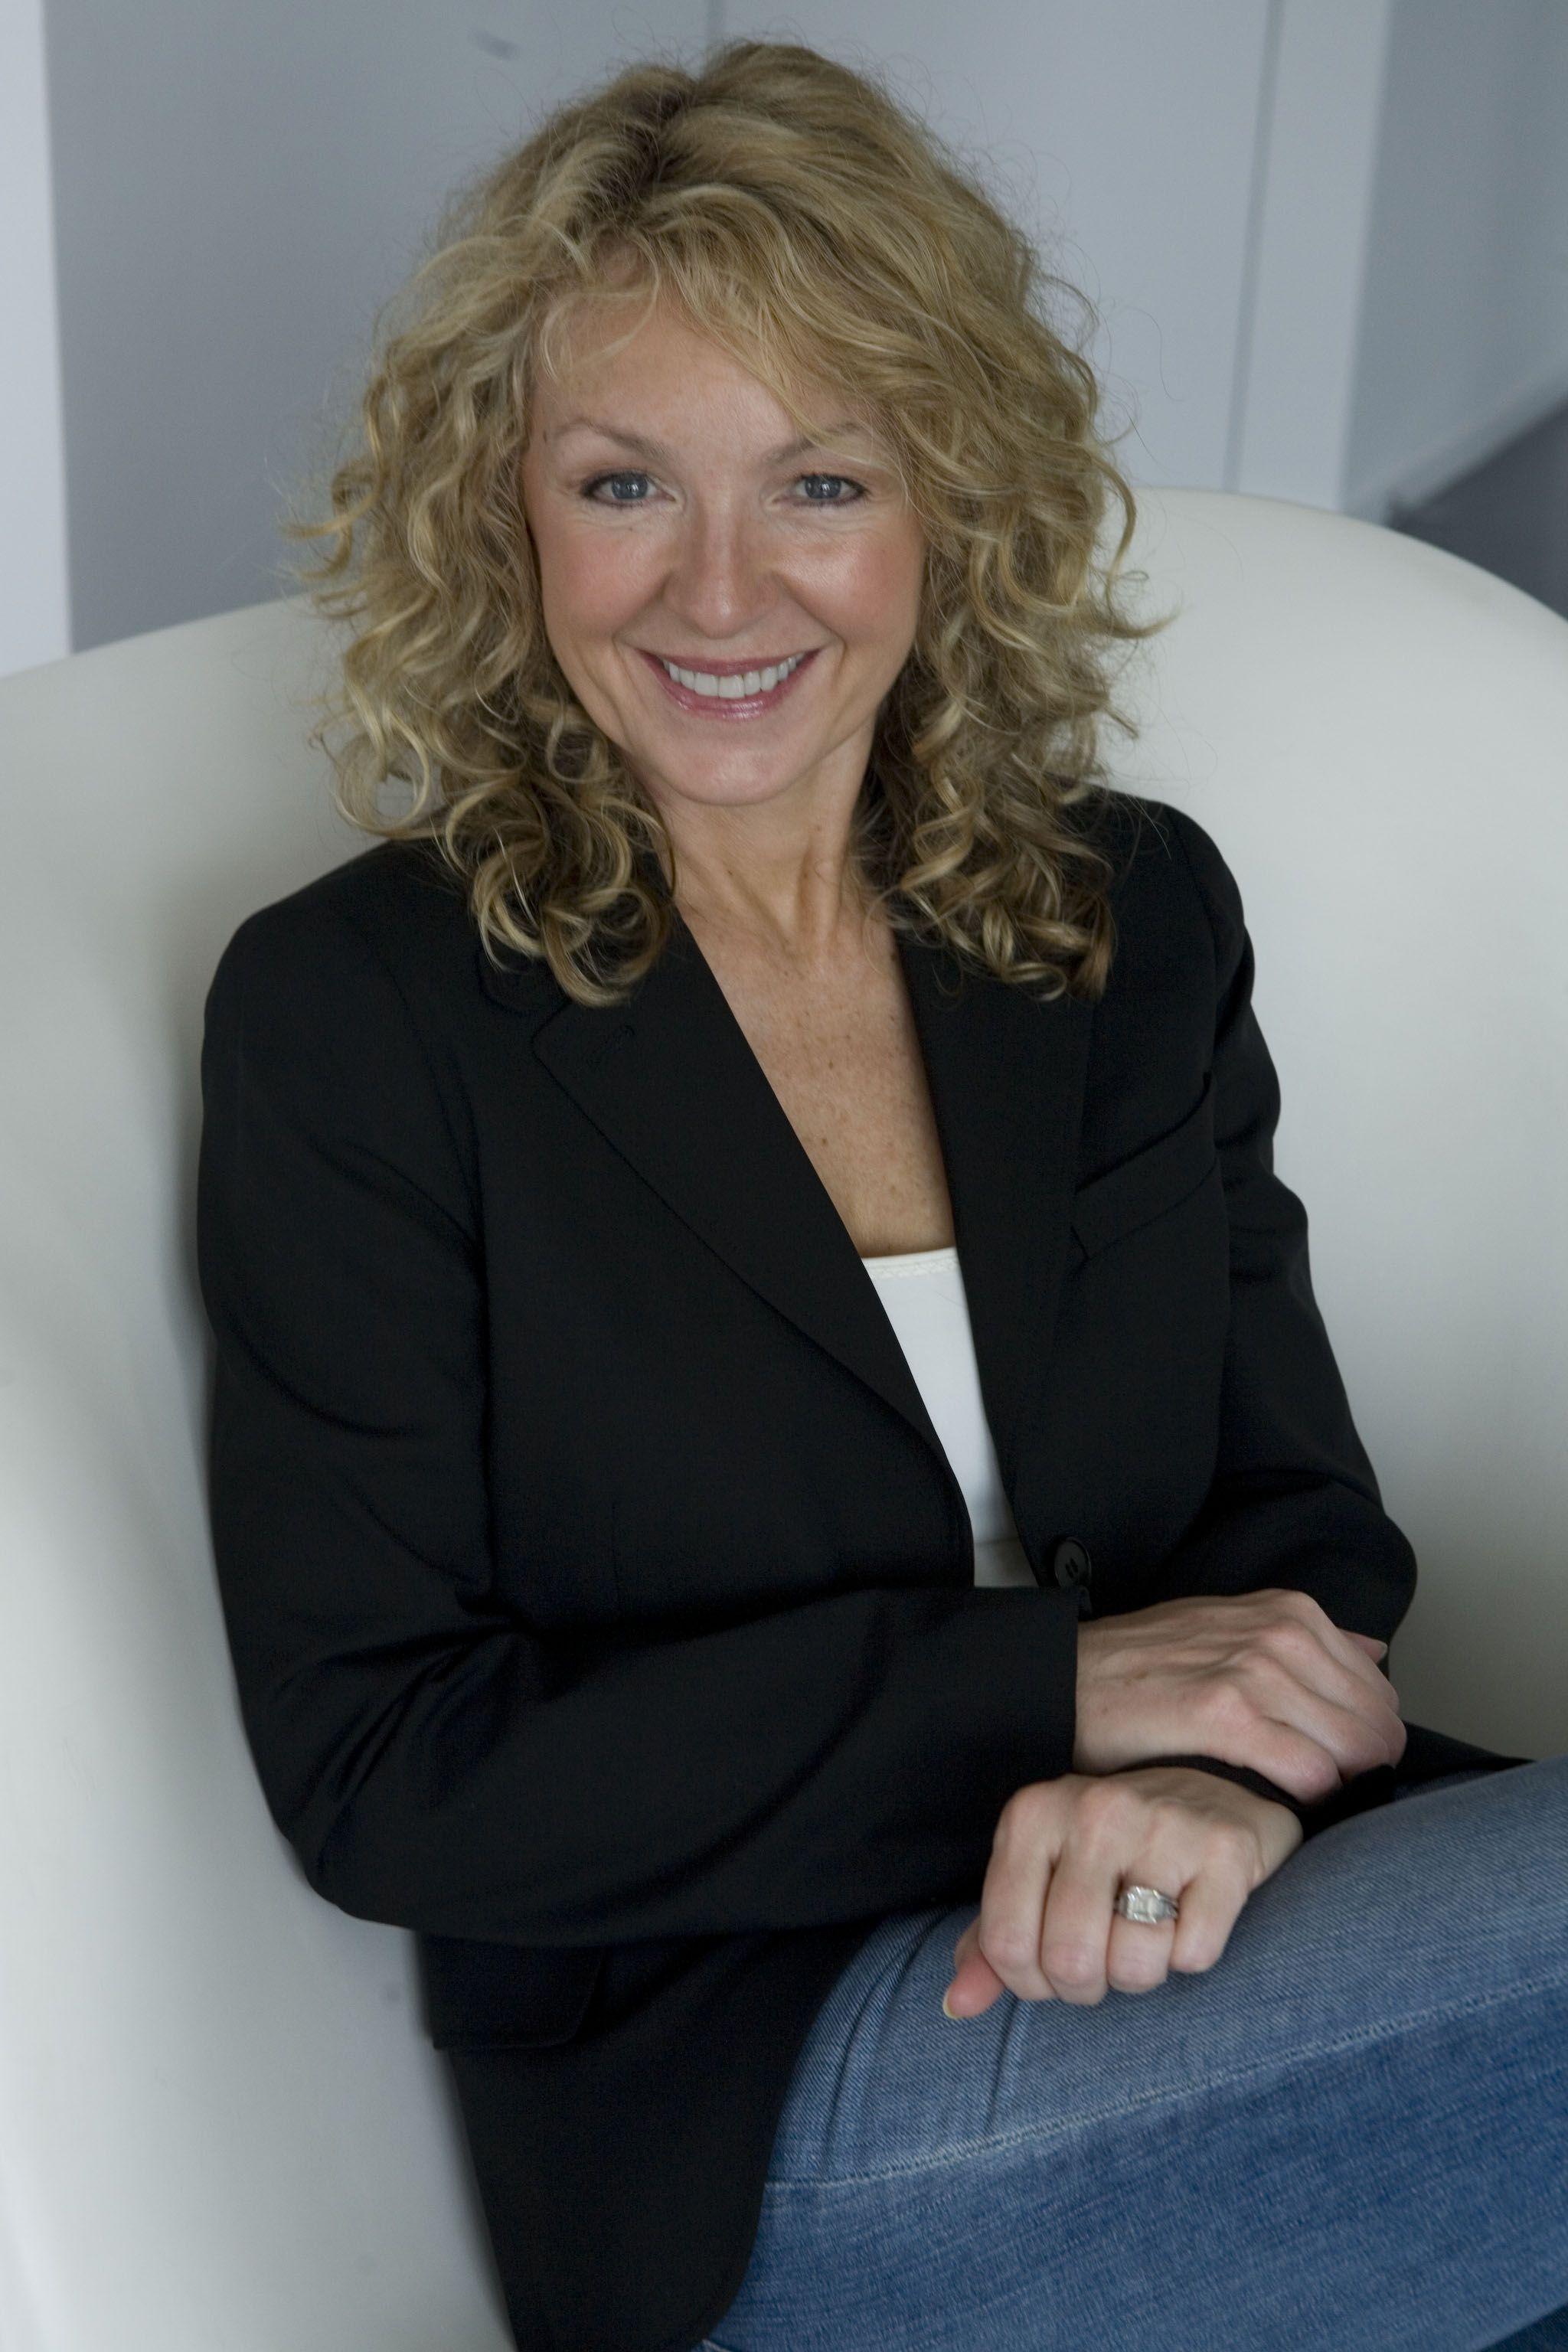 Medium Curly hair Styles For Women Over 40 | Hair Styles For Women Over 50 | The Best of Everything After 50